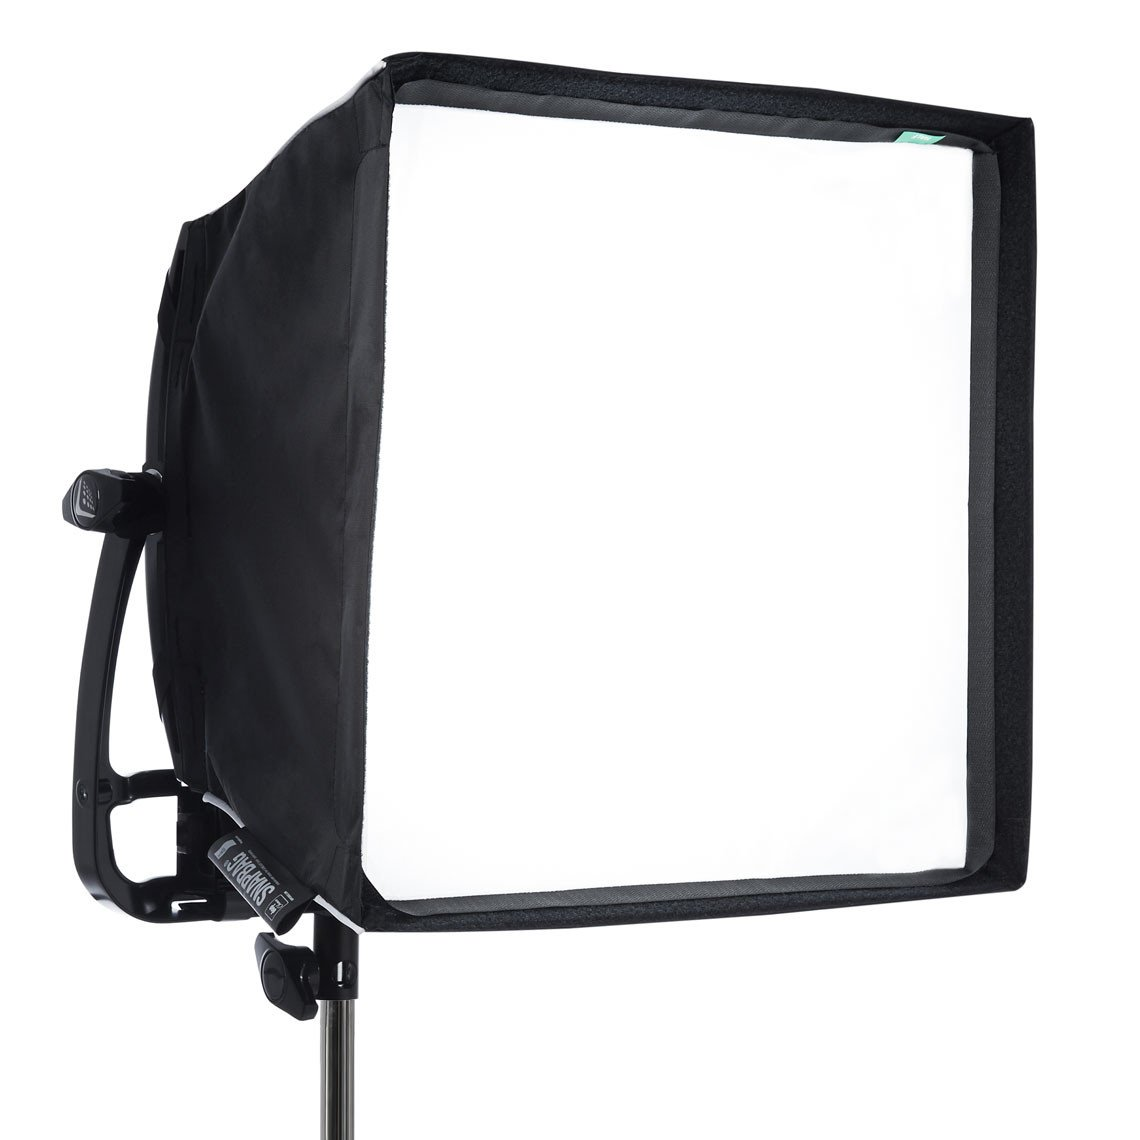 Snapbag Soft Box for Astra 1x1